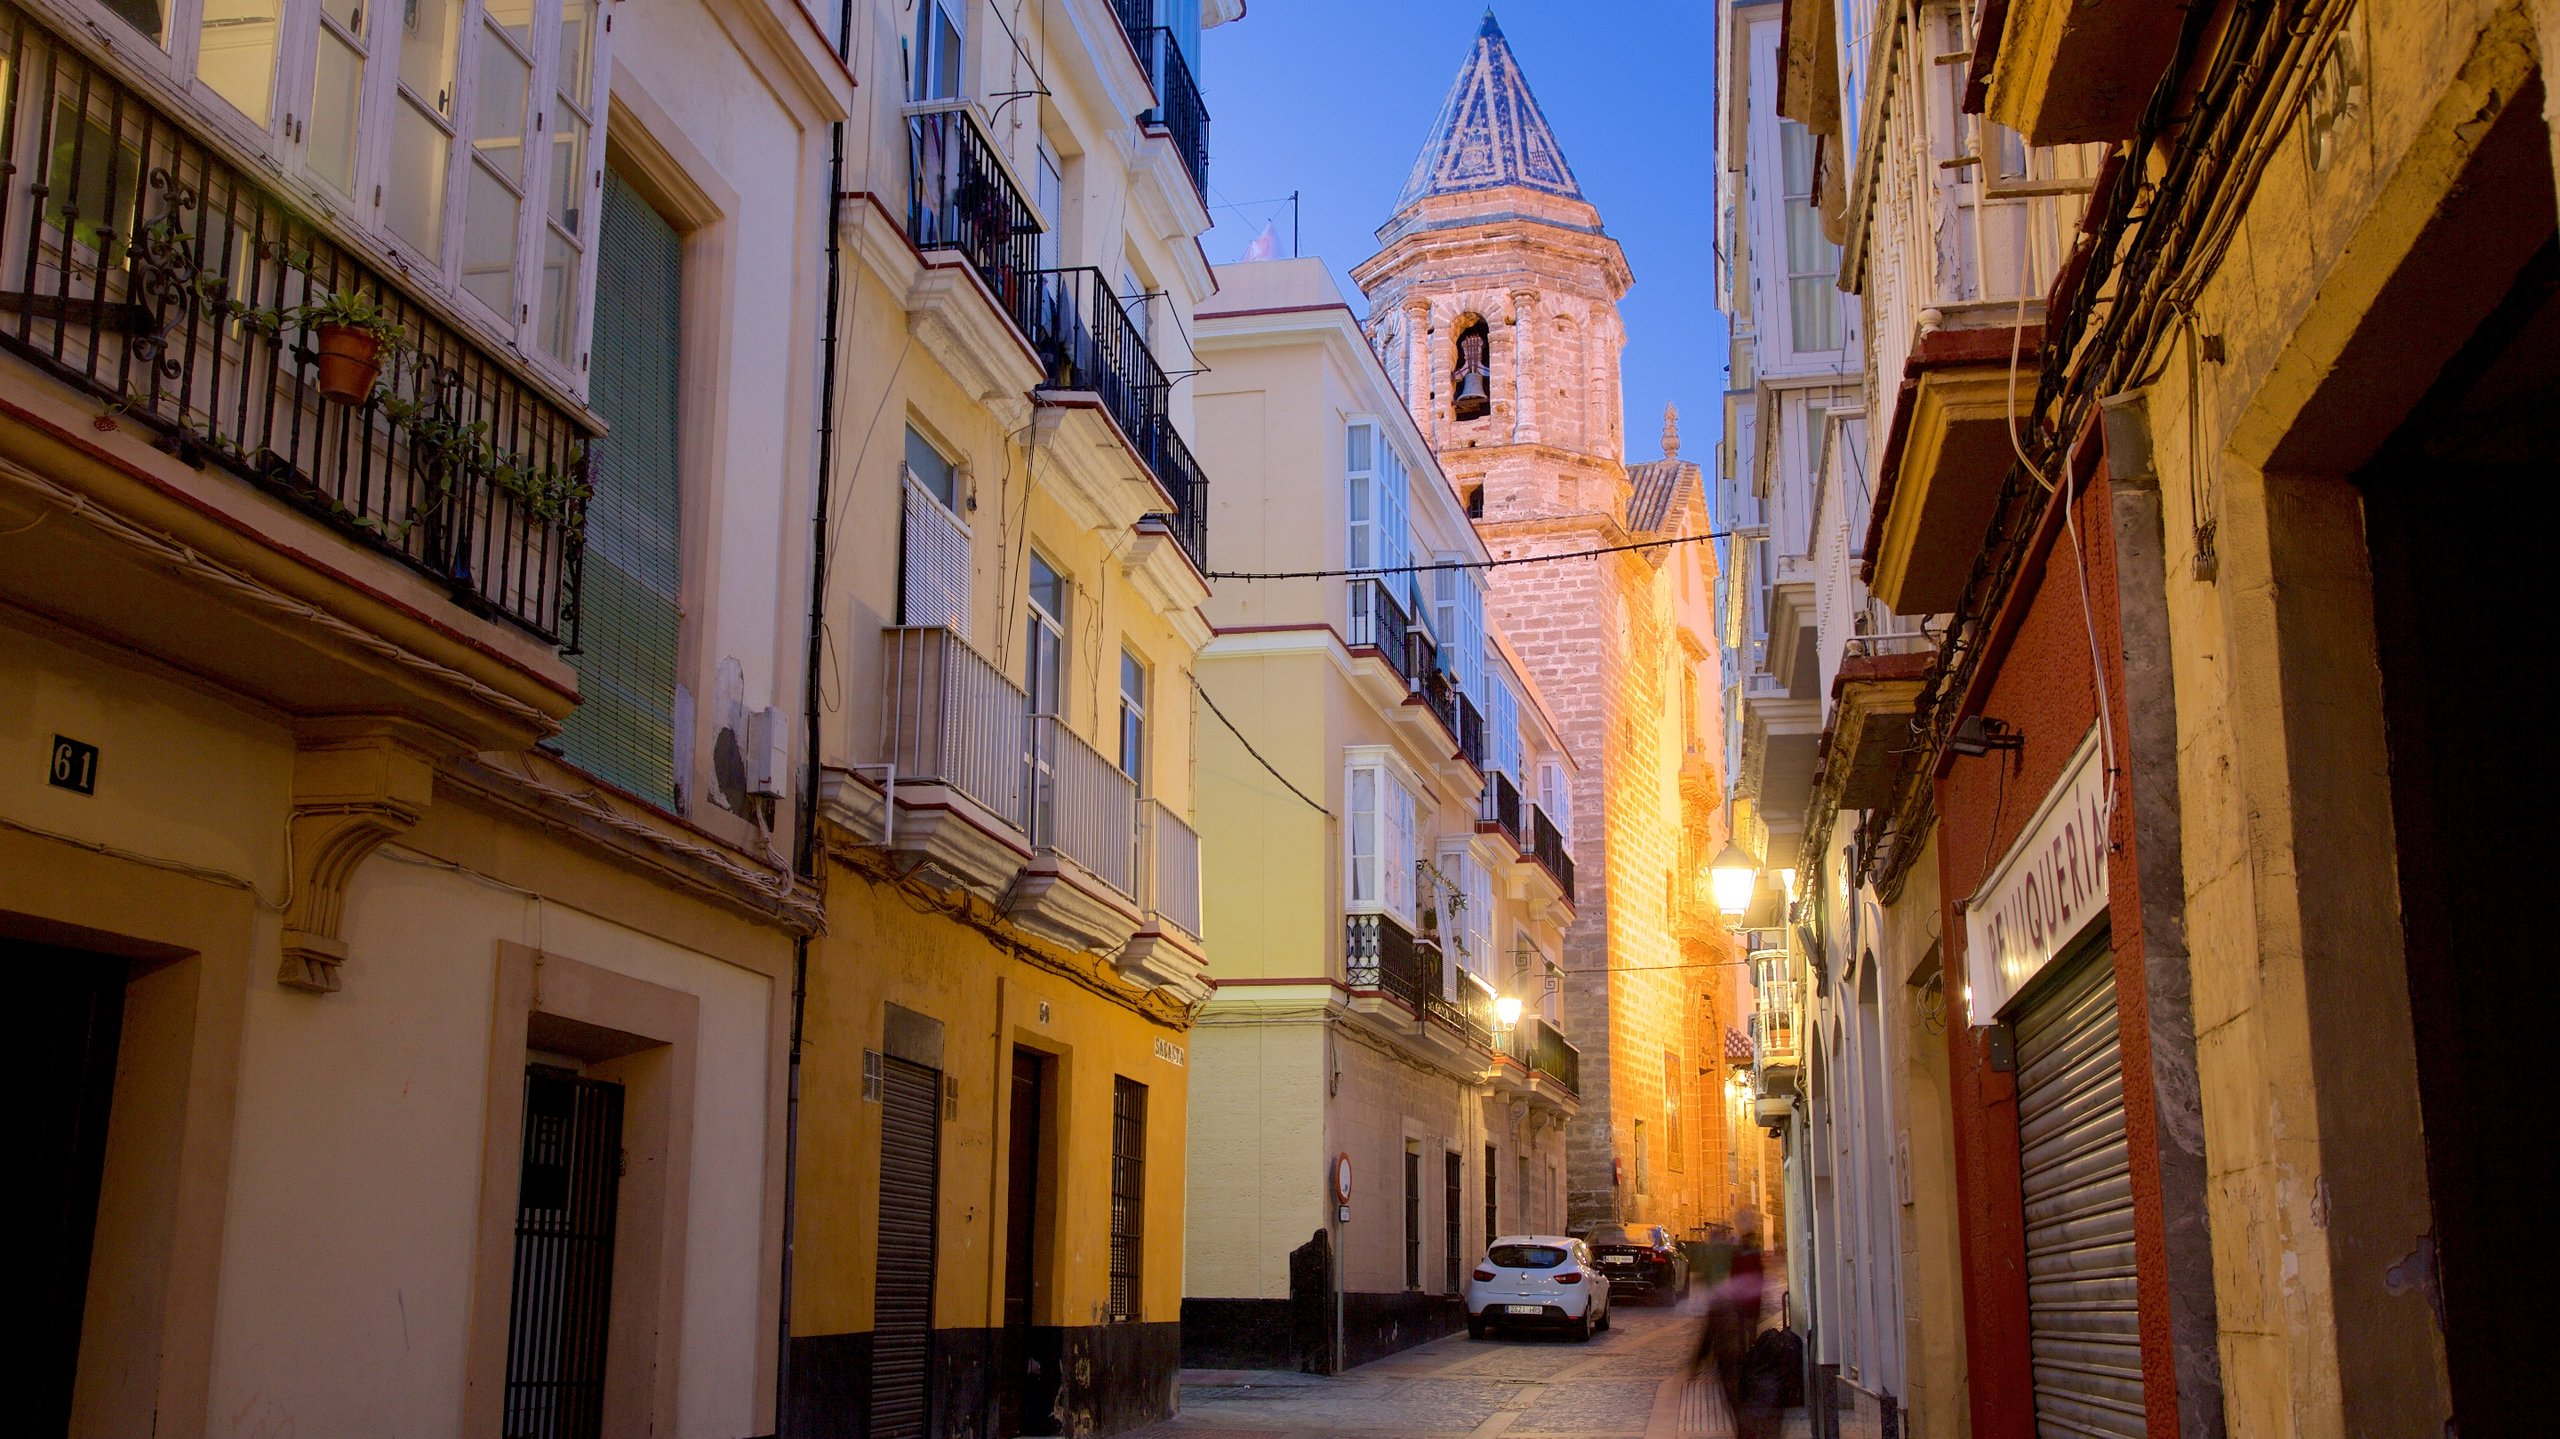 Cadiz Province, Andalusia, Spain